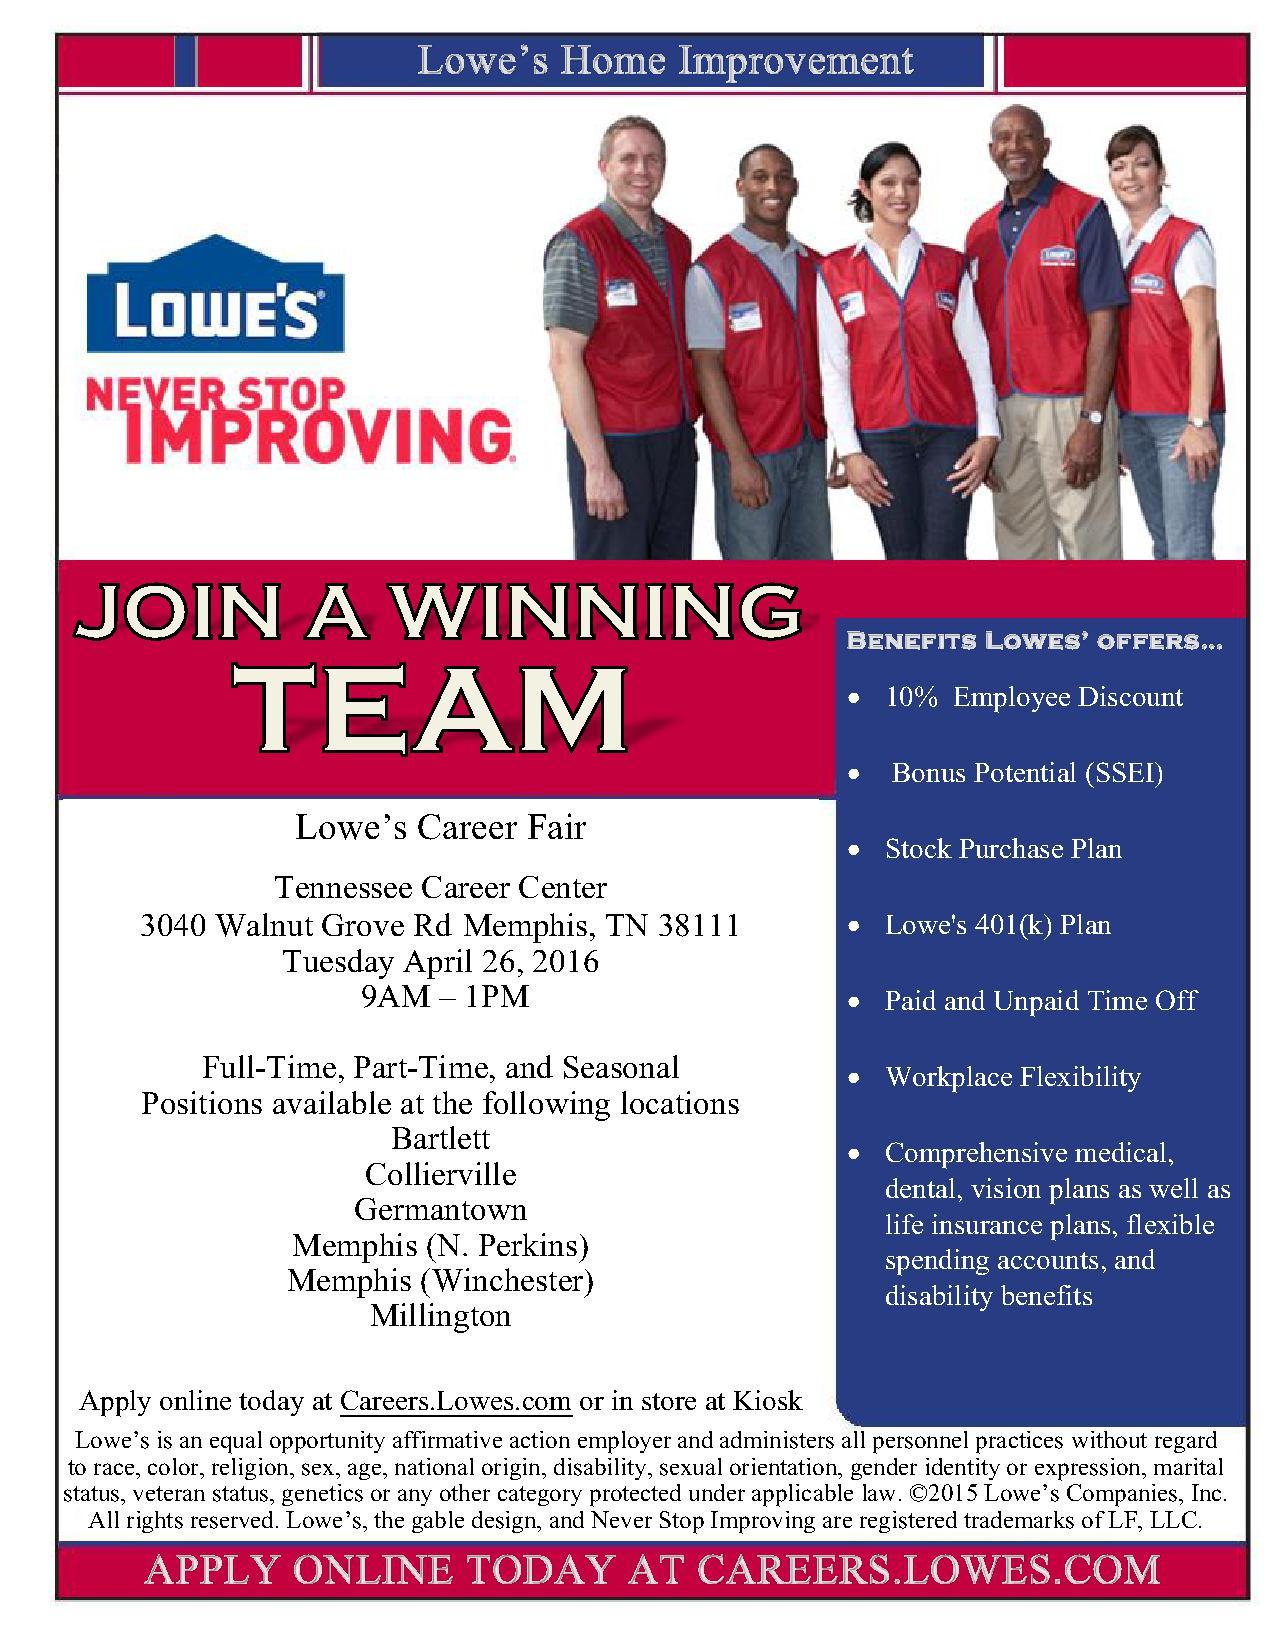 Lowes Job Fair TN Career Center 42616 Job Amp Career News From The Memphis Public Libraries